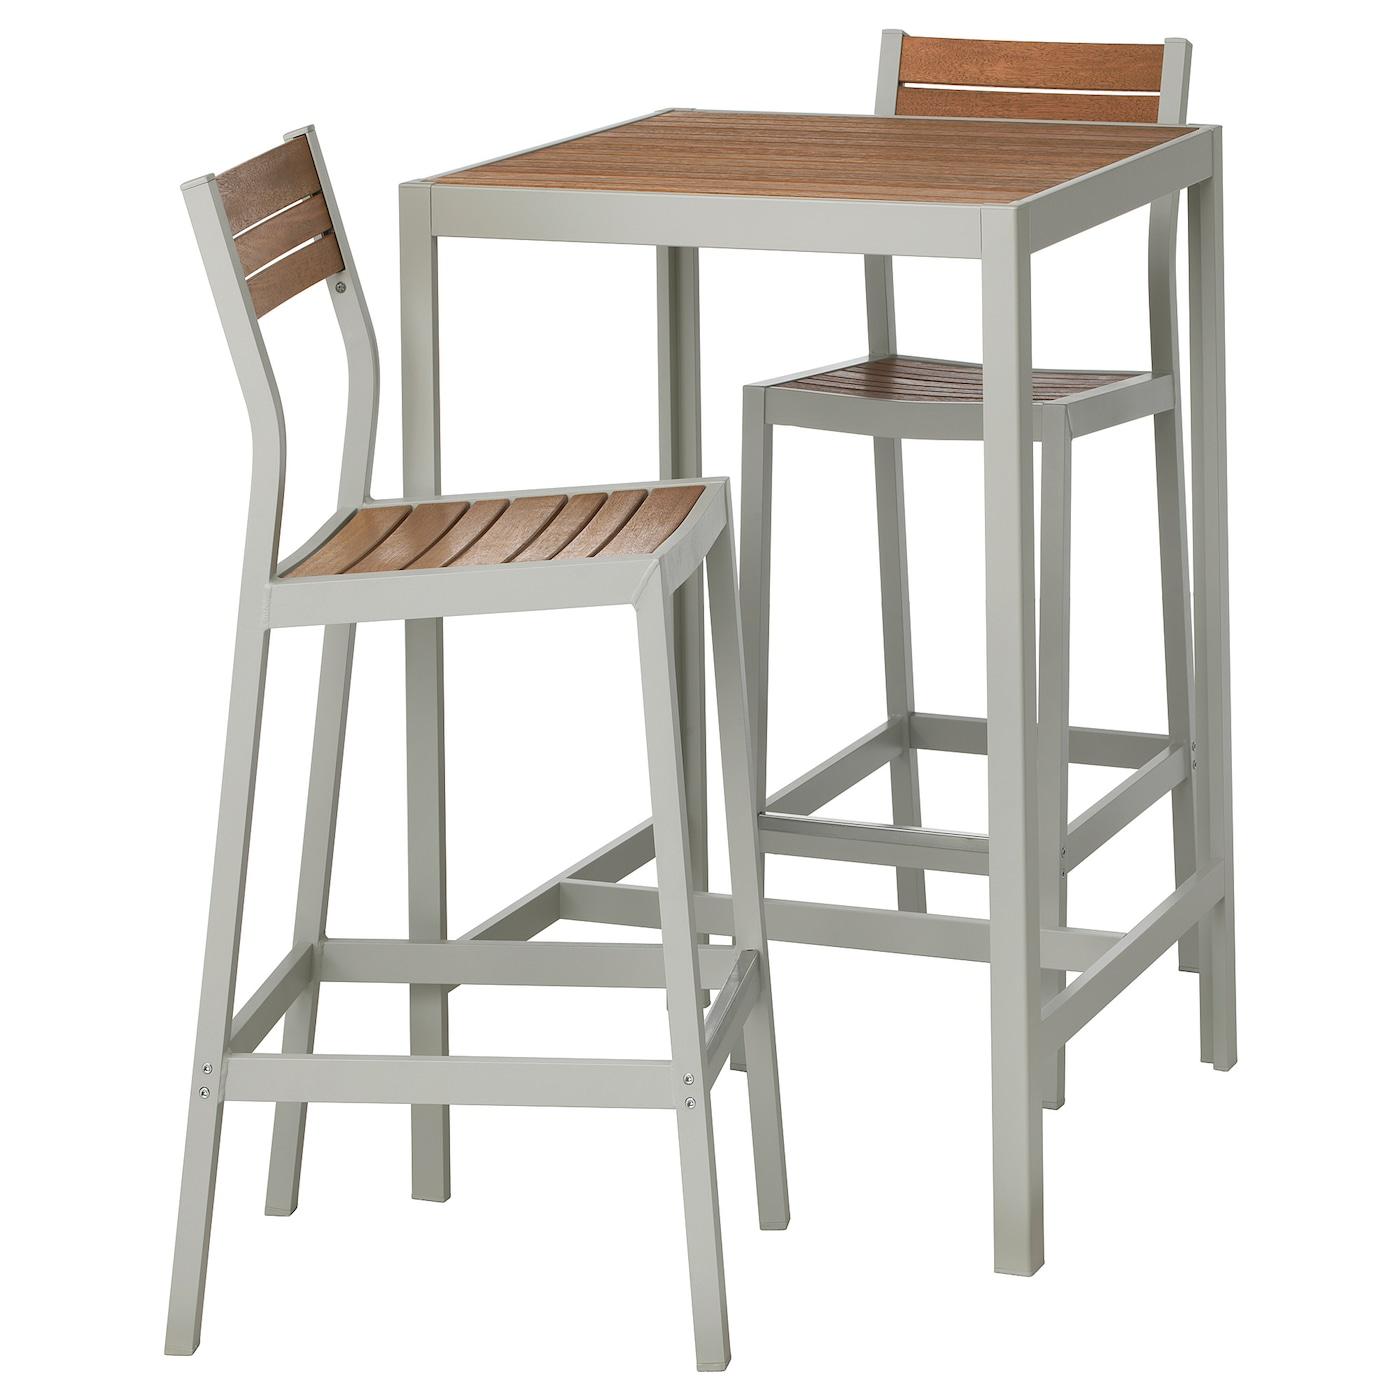 Phenomenal Bar Table And 2 Bar Stools Outdoor Sjalland Light Brown Light Grey Machost Co Dining Chair Design Ideas Machostcouk